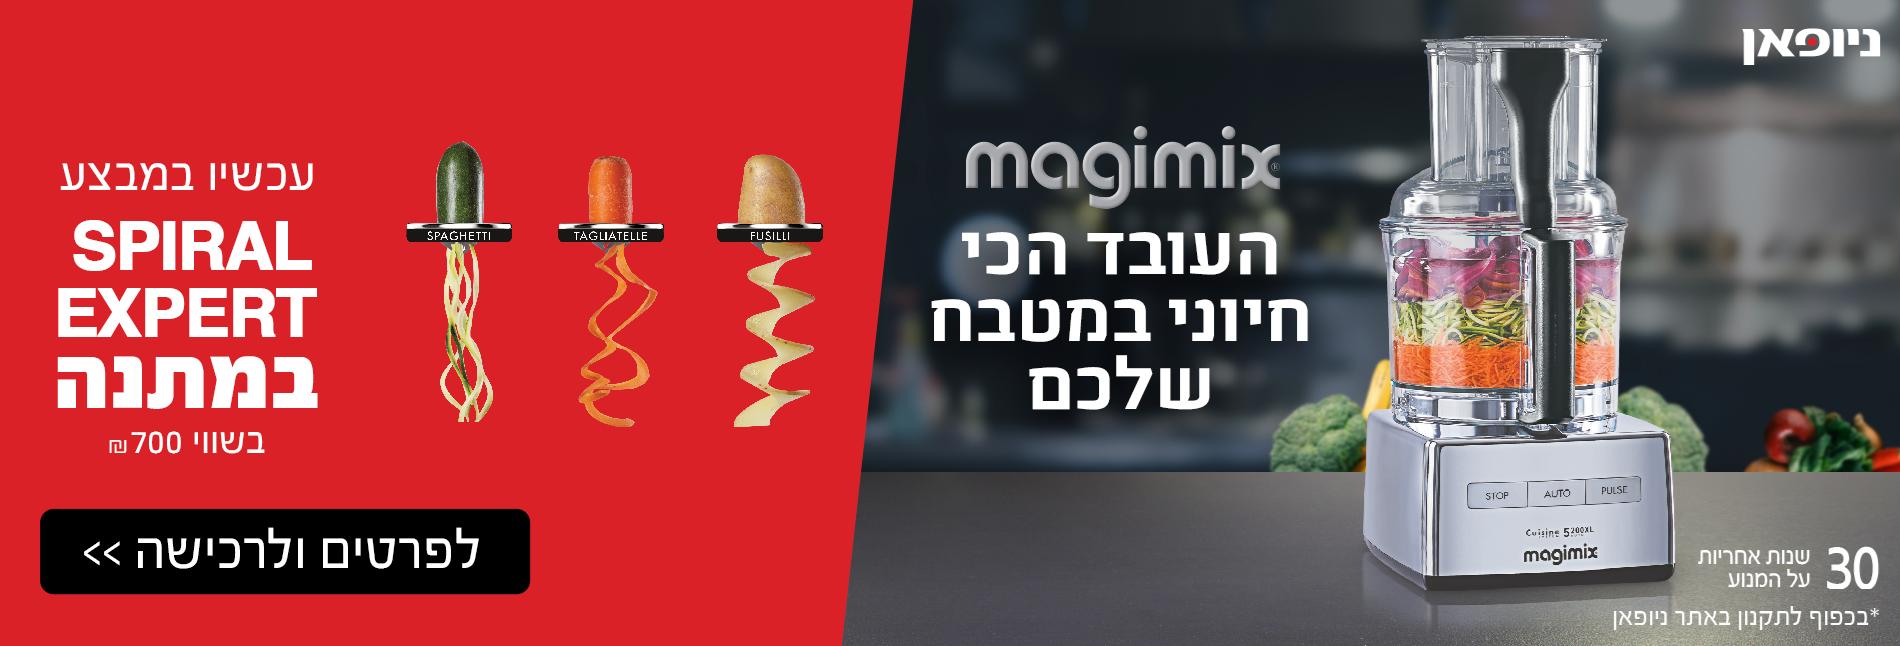 magimix העובד הכי חיוני במטבח שלכם, 30 שנות אחריות על המנוע *בכפוף לתקנון באתר ניופאן. עכשיו במבצע: SPIRAL EXPERT במתנה בשווי 700 ₪. לחץ לפרטים ולרכישה